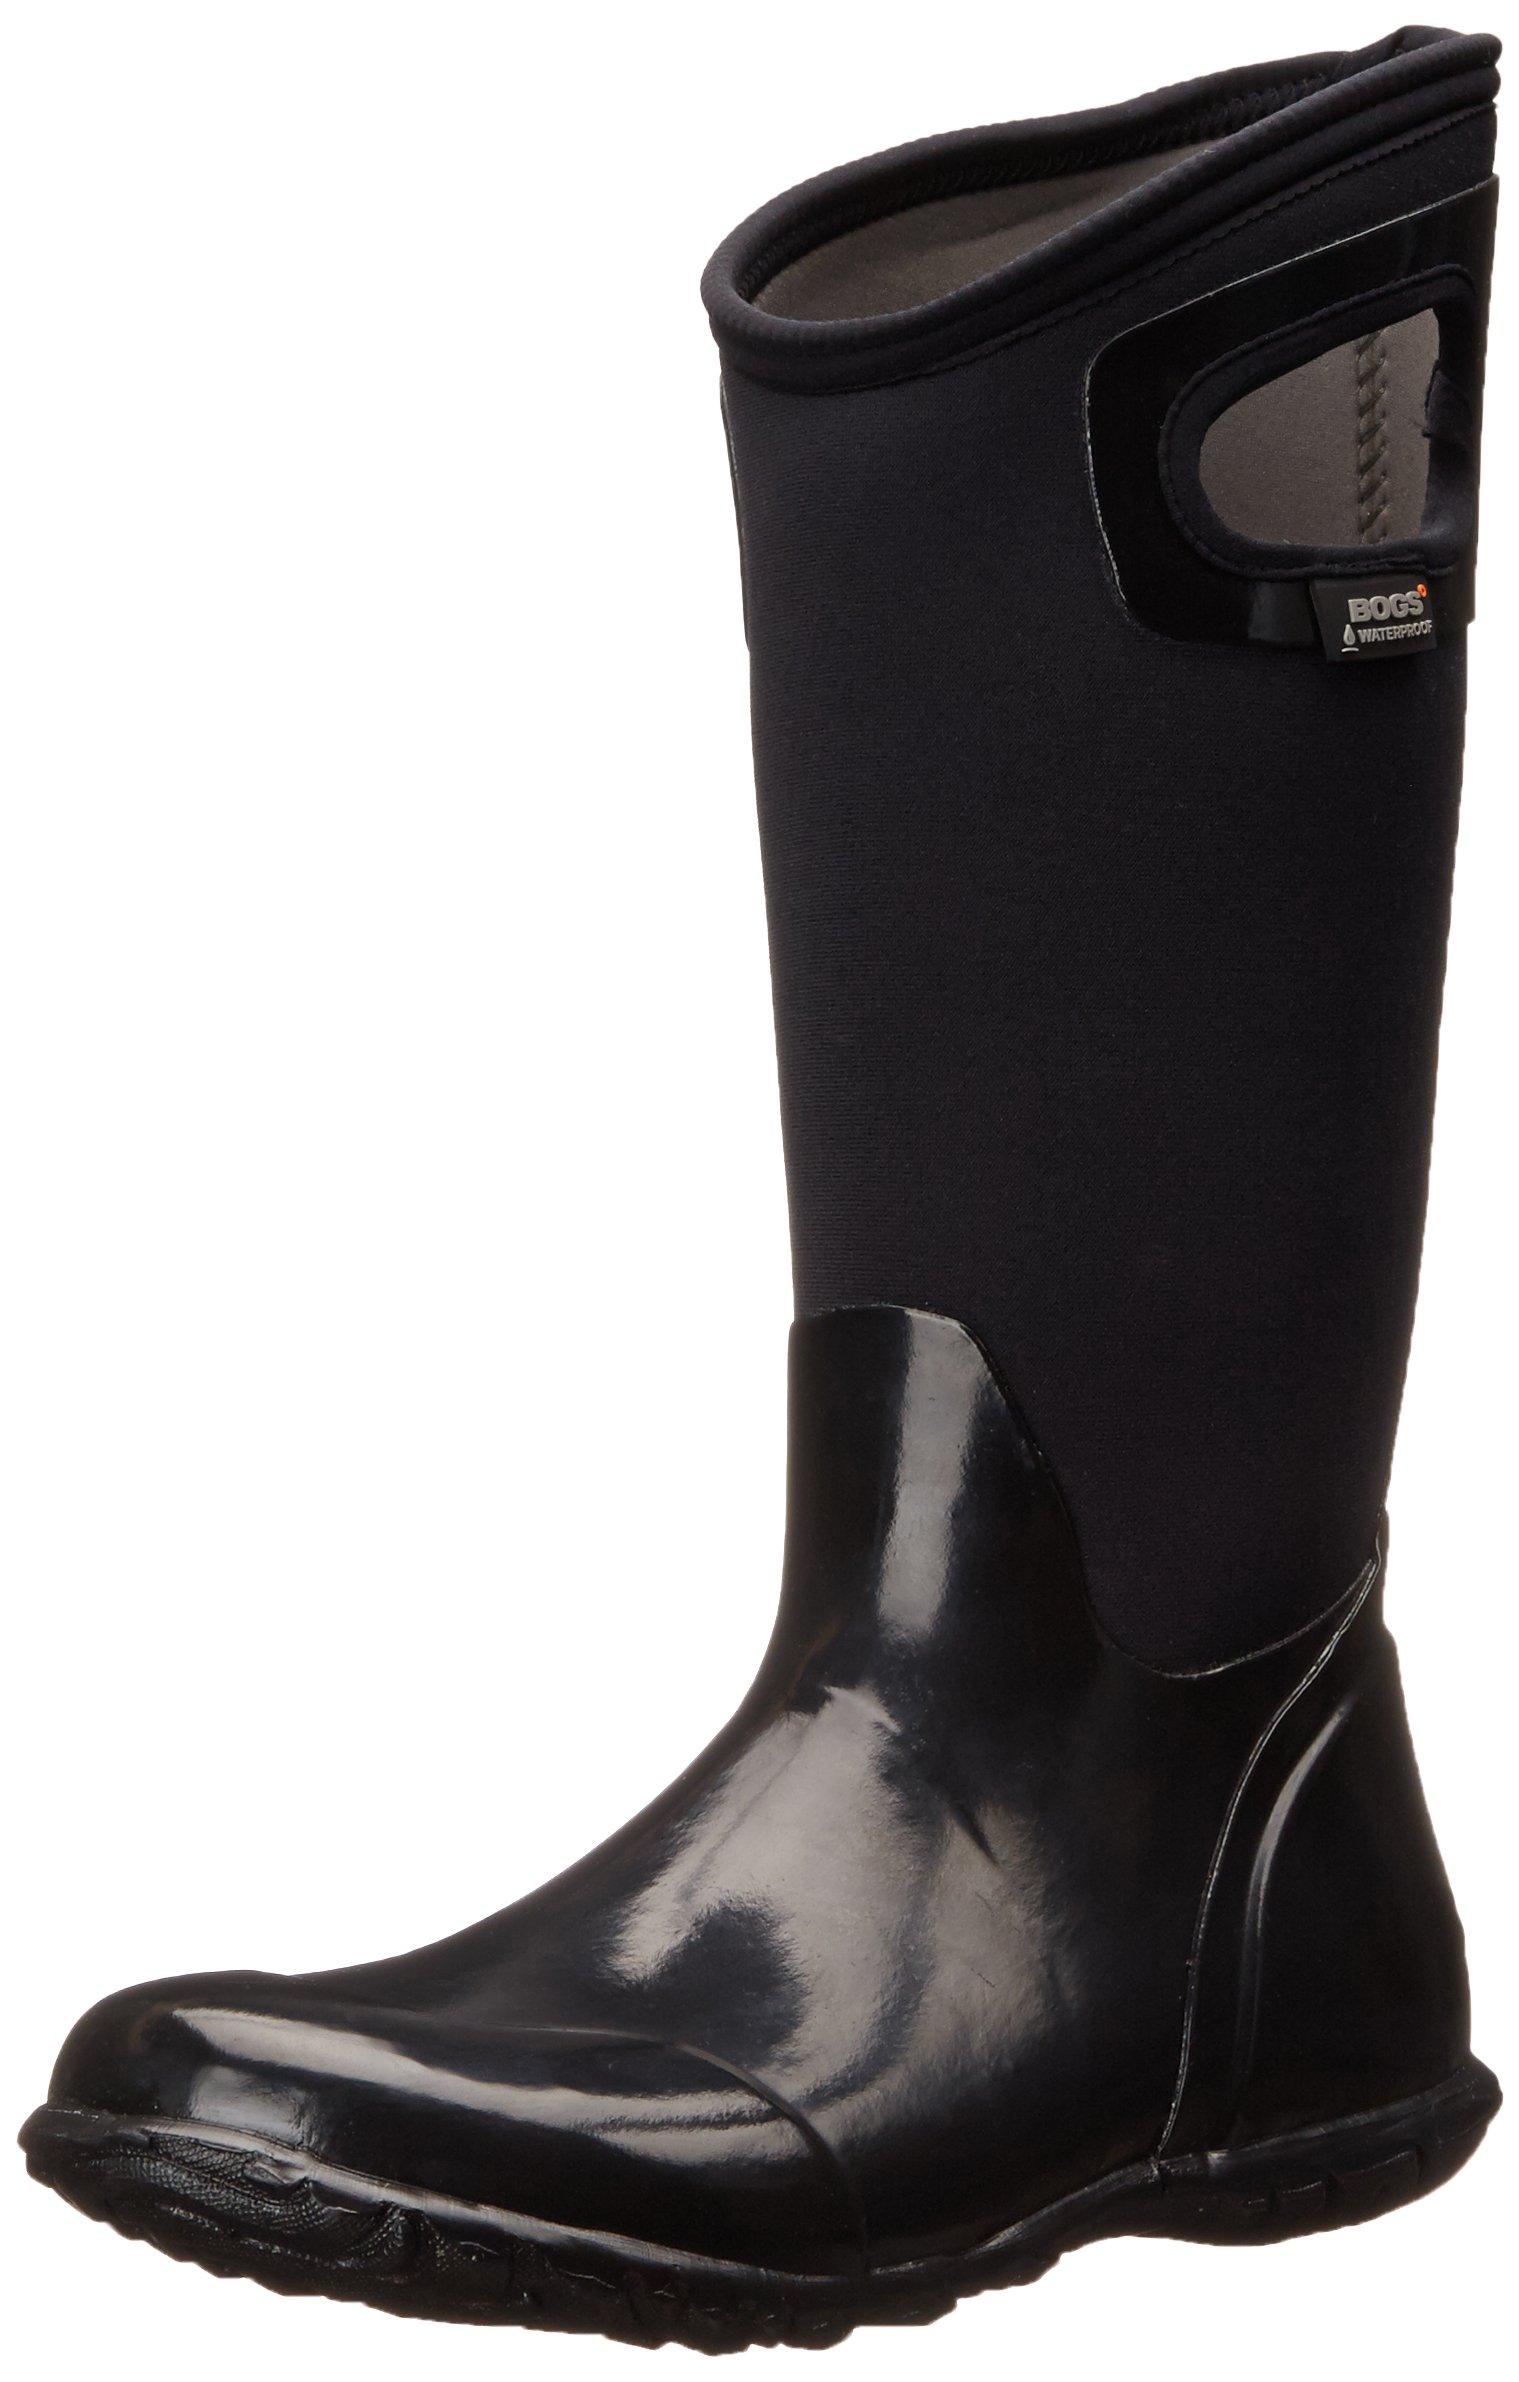 Bogs Women's North Hampton Solid All Weather Rain Boot, Black,8 M US